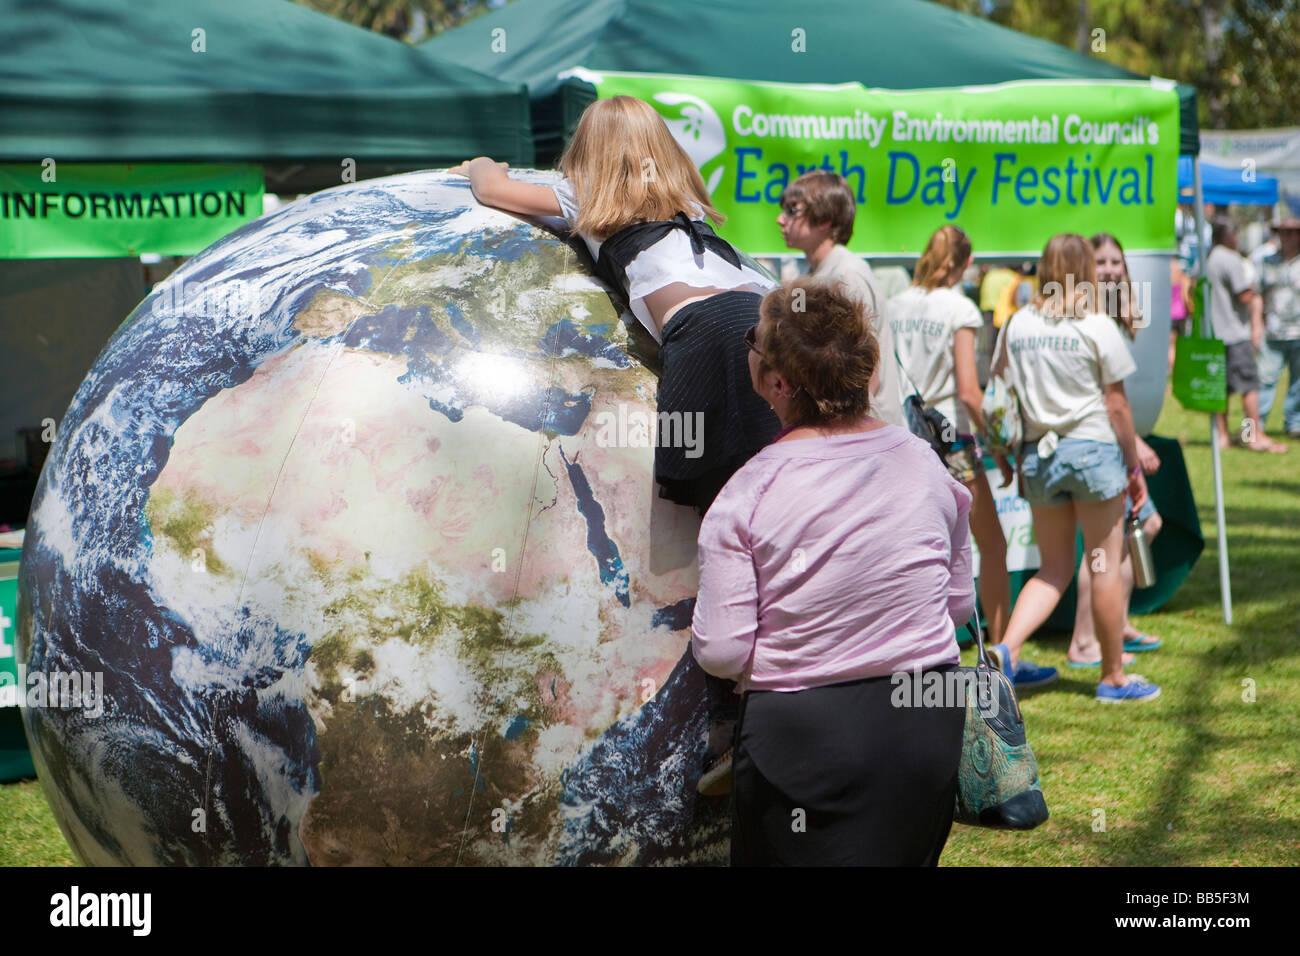 child playing with inflated world globe Earth Day Celebration Santa Barbara California United States of America - Stock Image